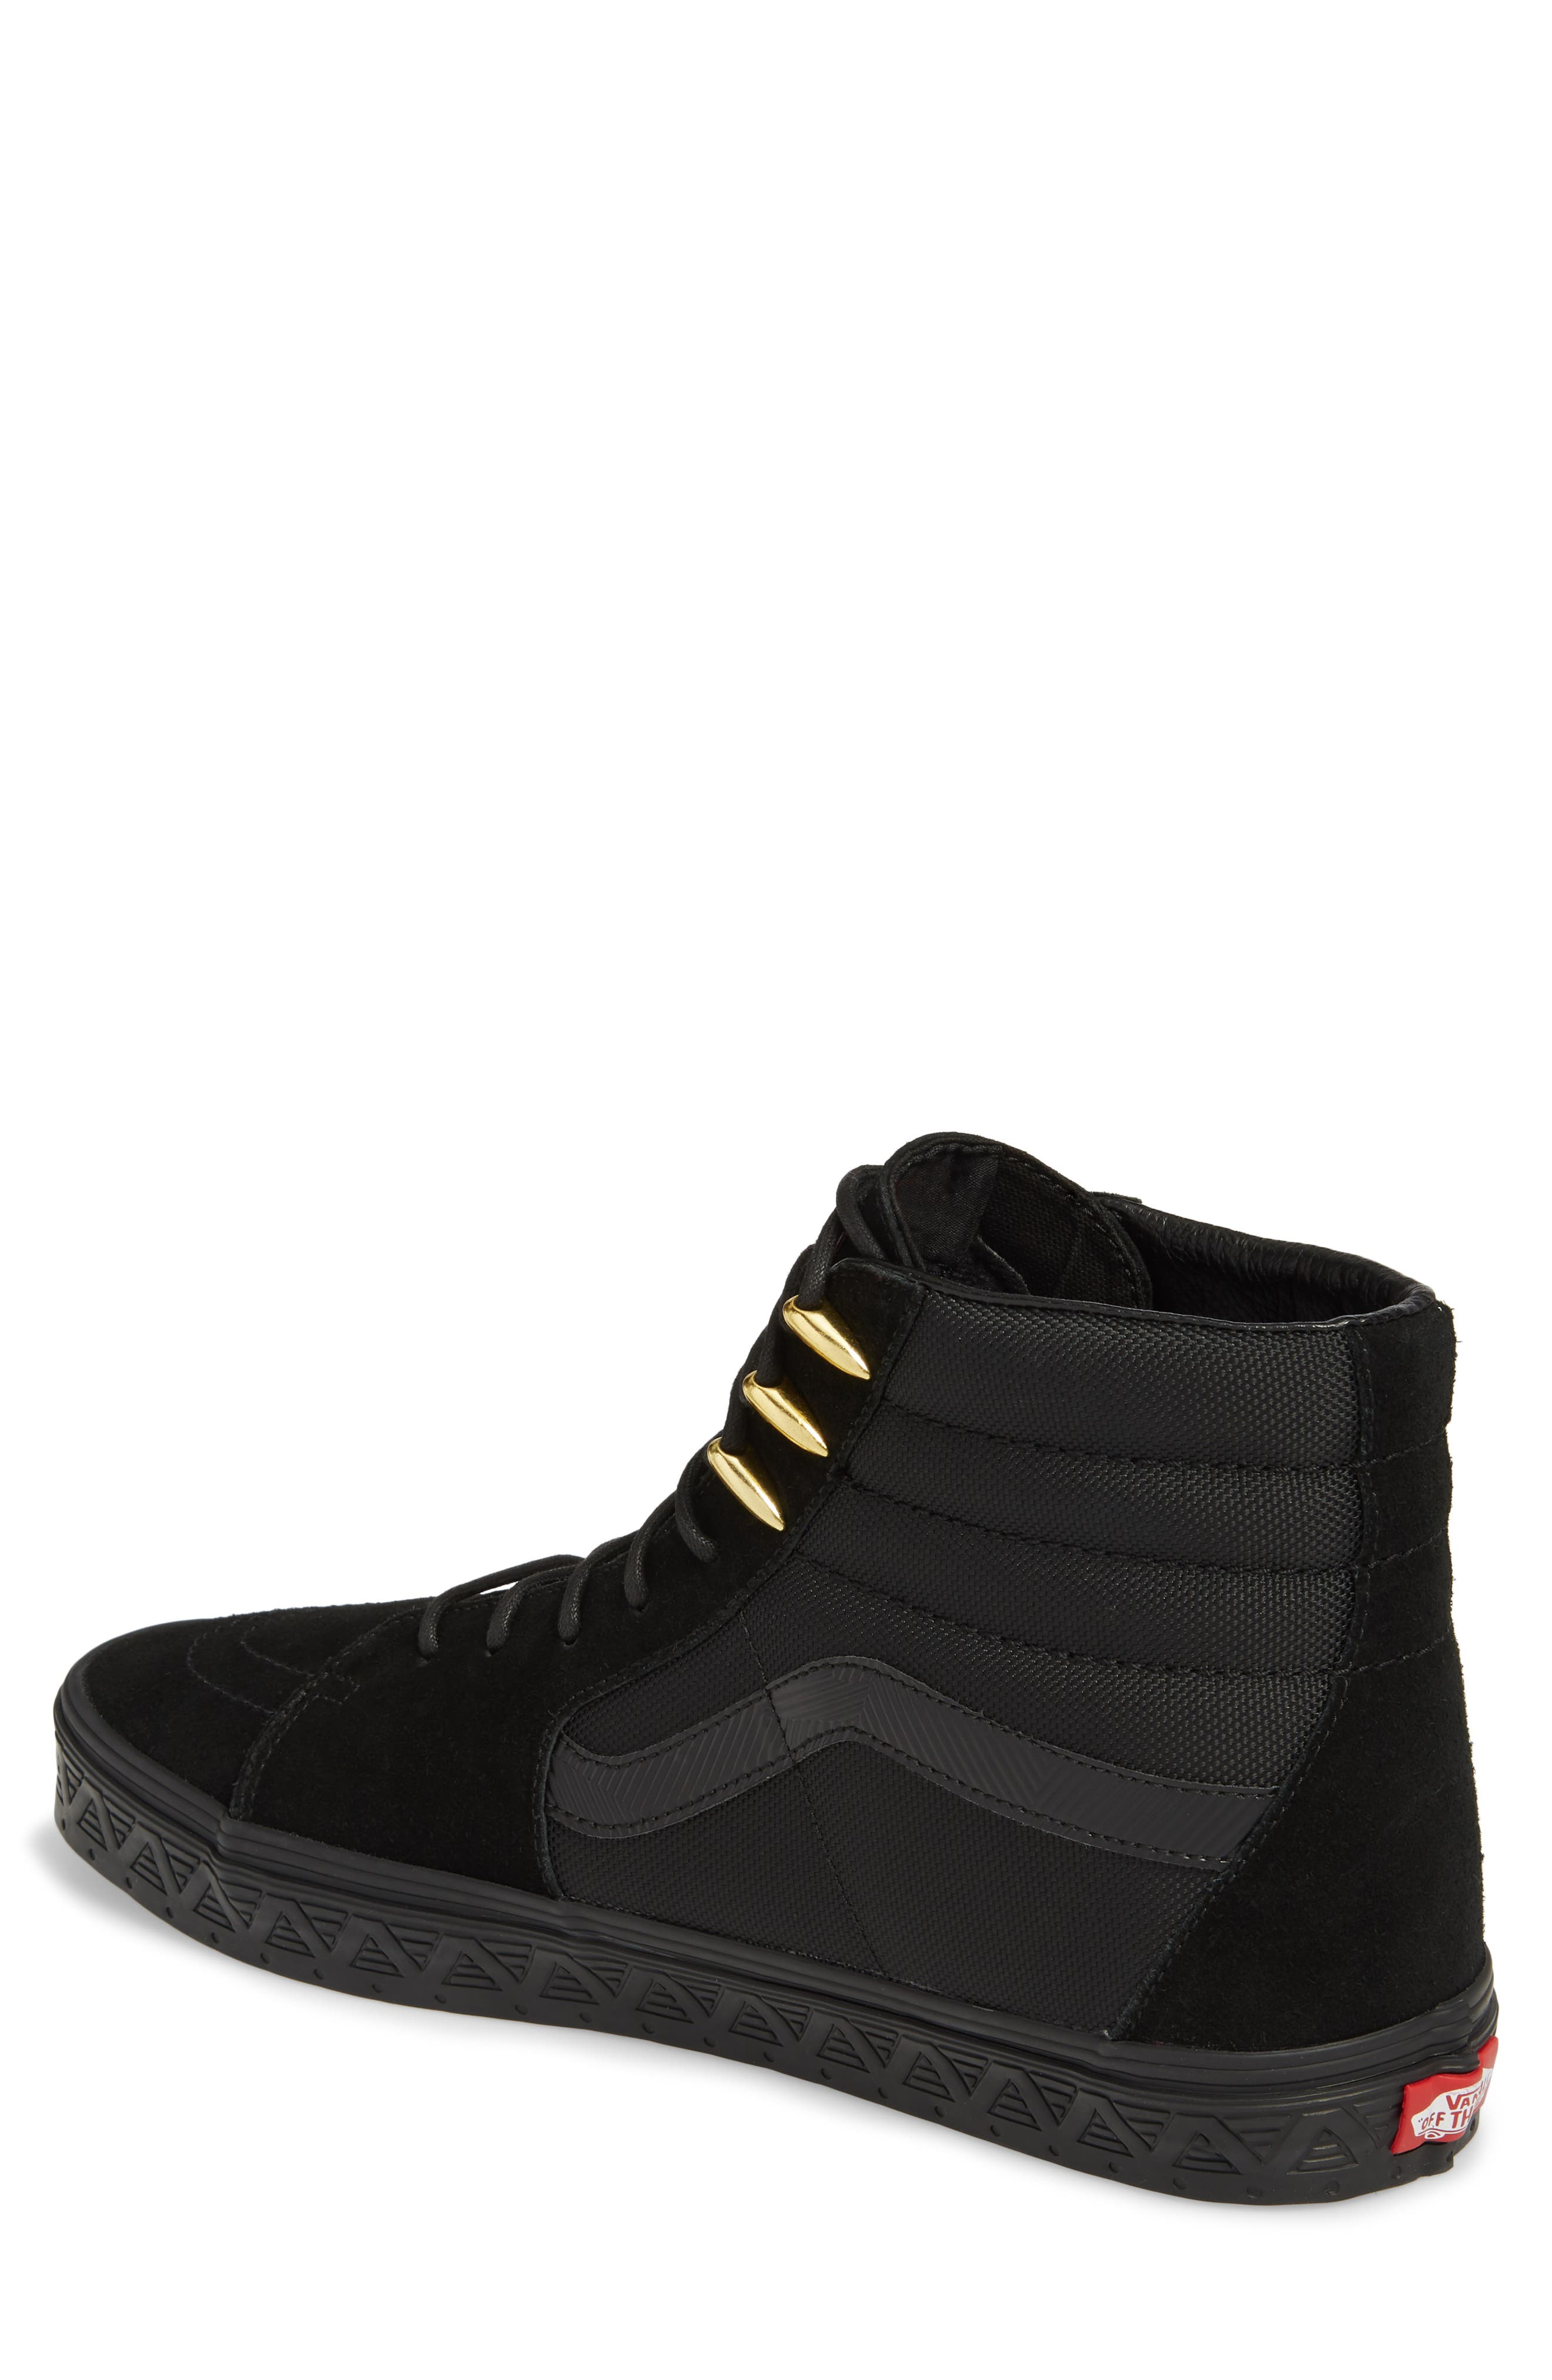 x Marvel<sup>®</sup> UA Sk8-Hi Sneaker,                             Alternate thumbnail 2, color,                             001